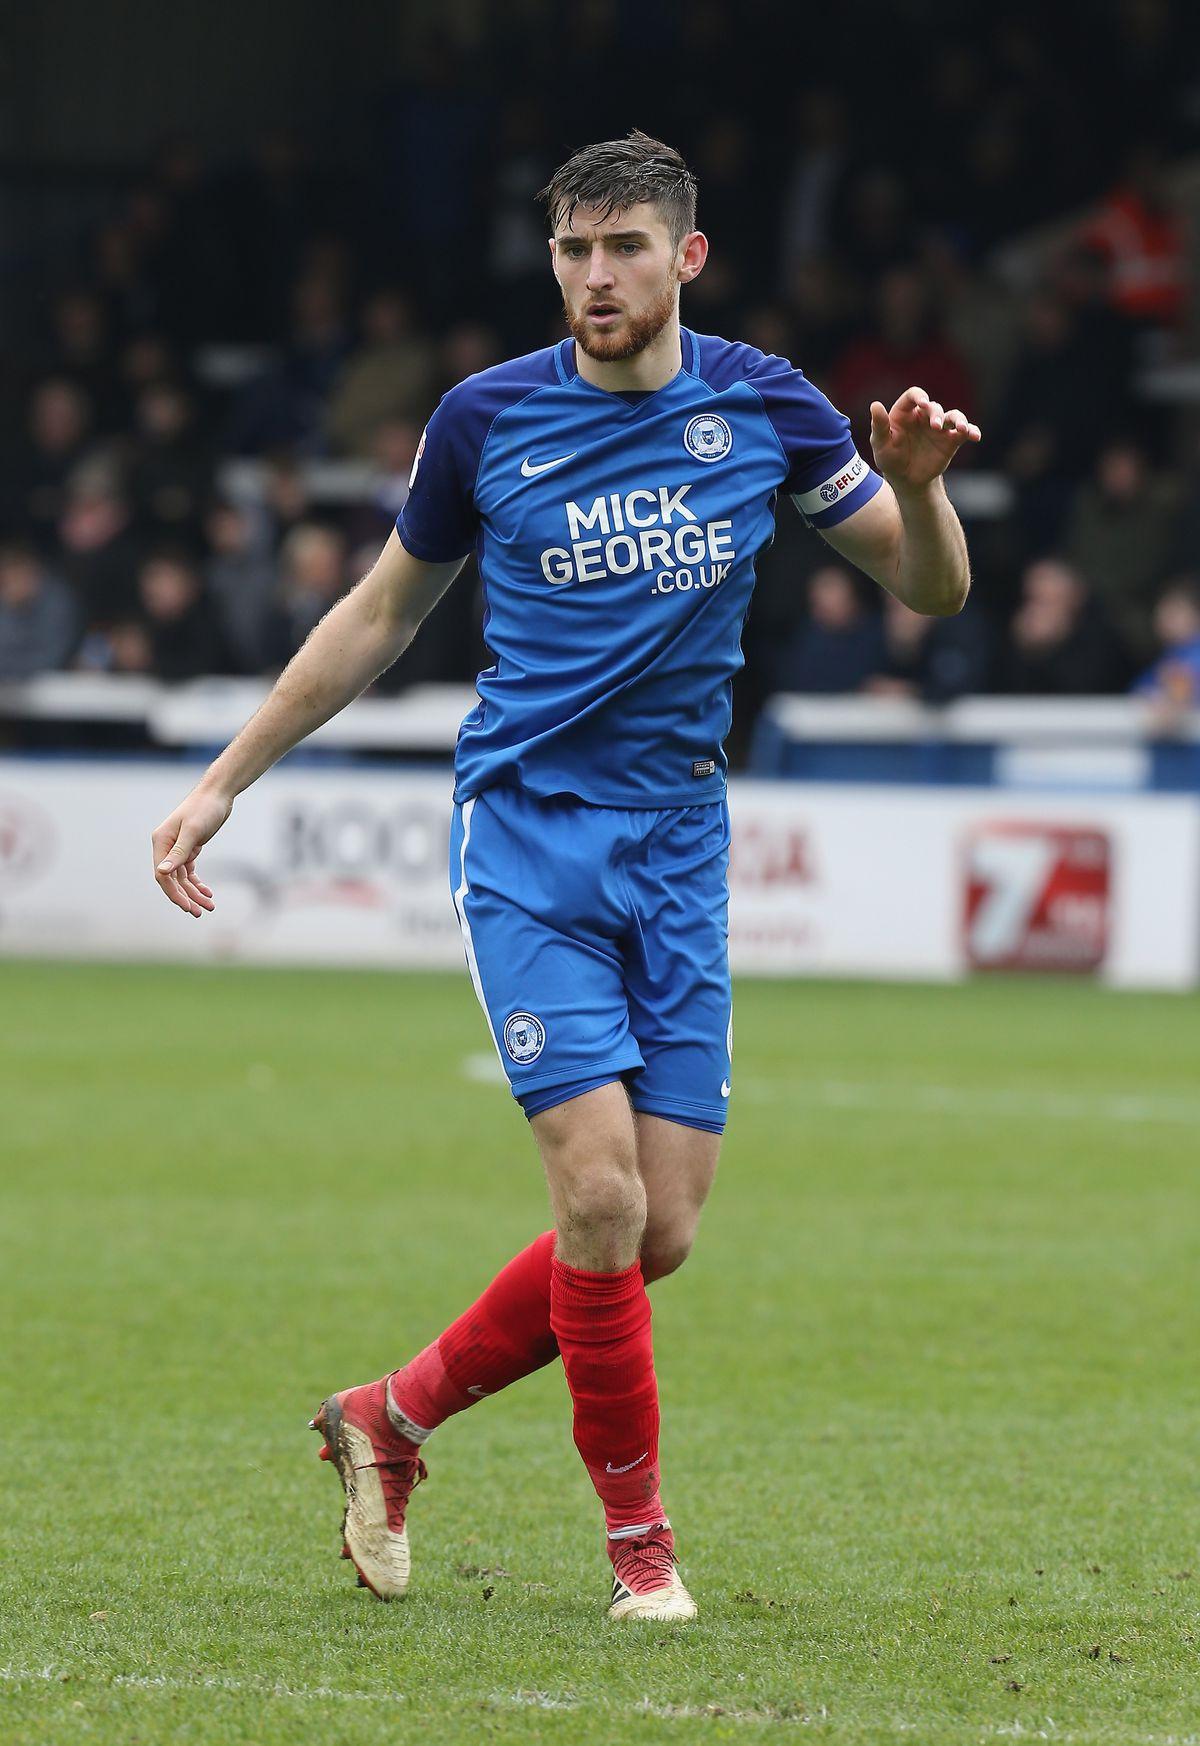 Peterborough United v Northampton Town - Sky Bet League One